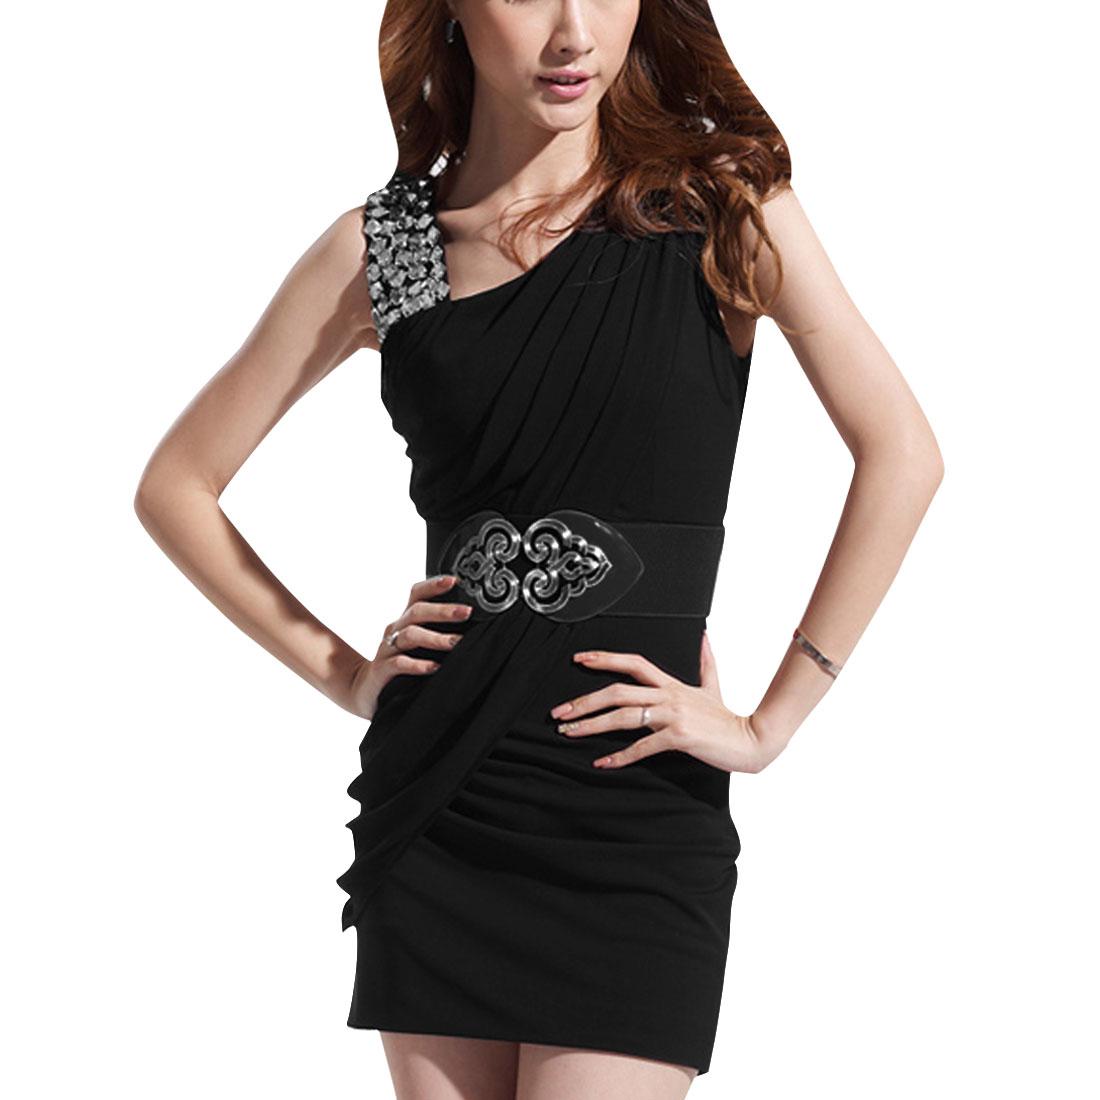 Women One Shoulder Rhinestone Decor Belt Dress Black XS